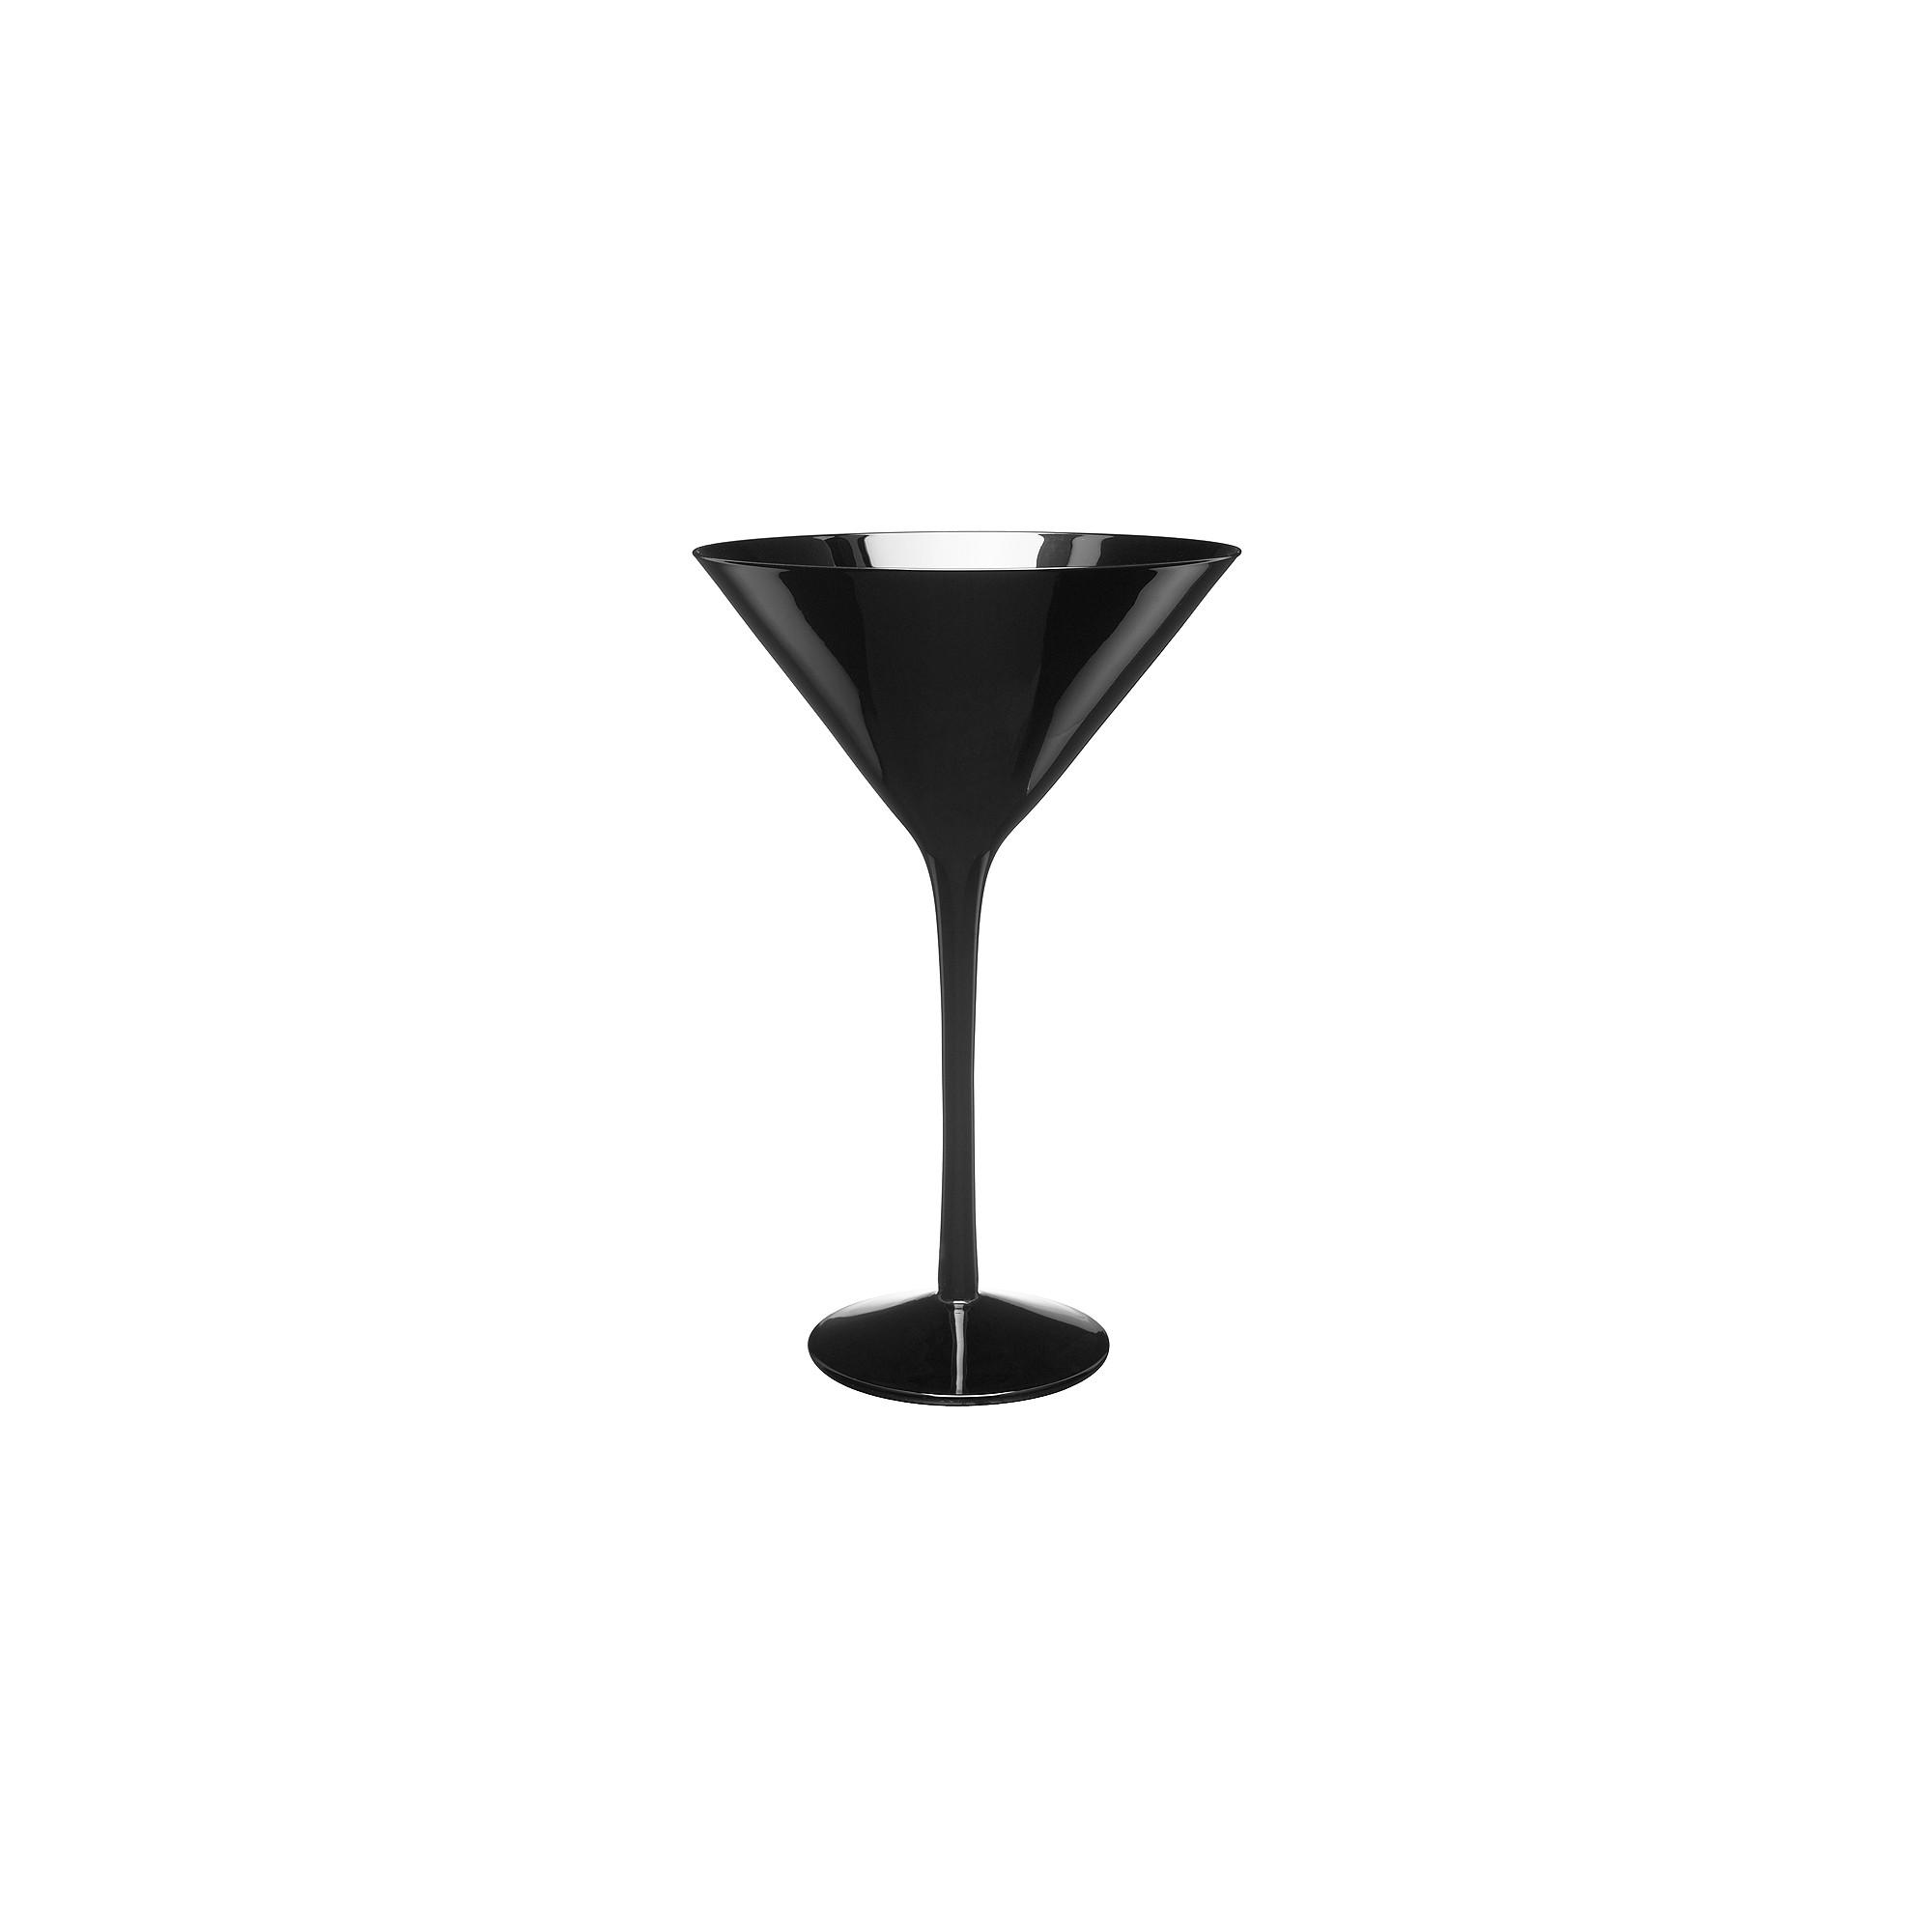 Artland 7oz 4pk Martini Glasses Black